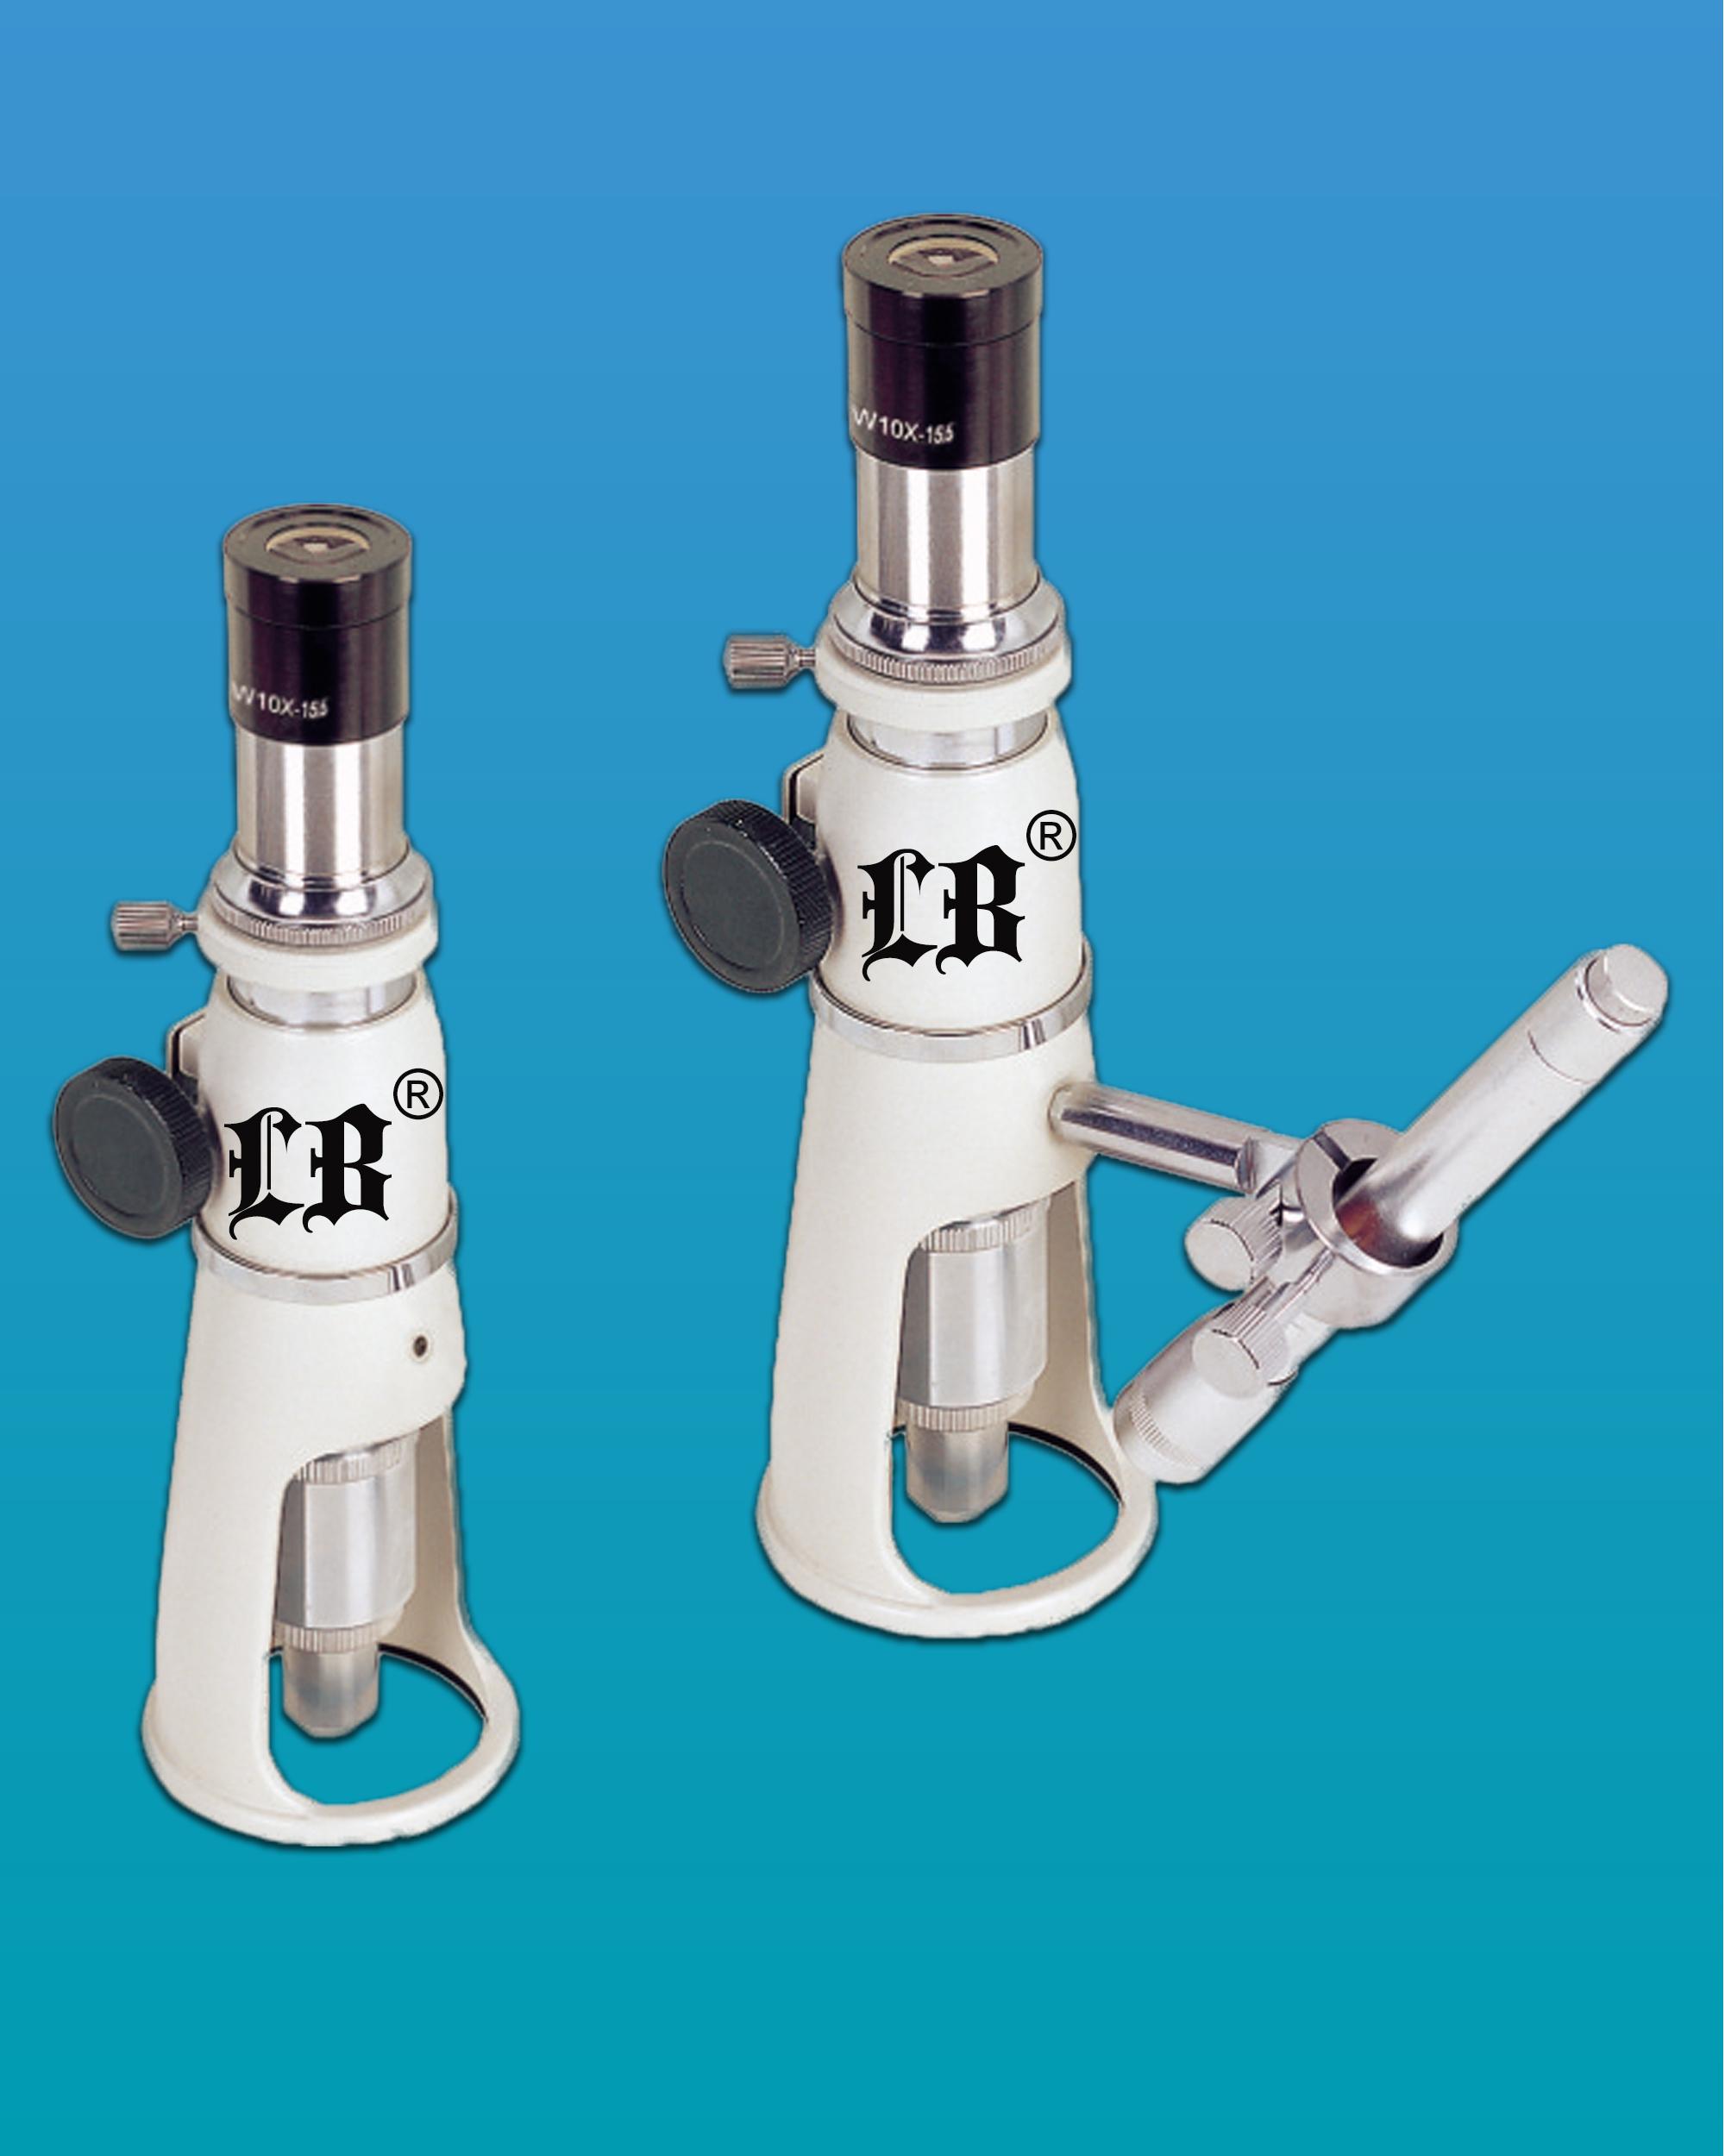 [LB-137] Portable Measuring Microscope w/ 40x Objective Zoom & LED Illumination